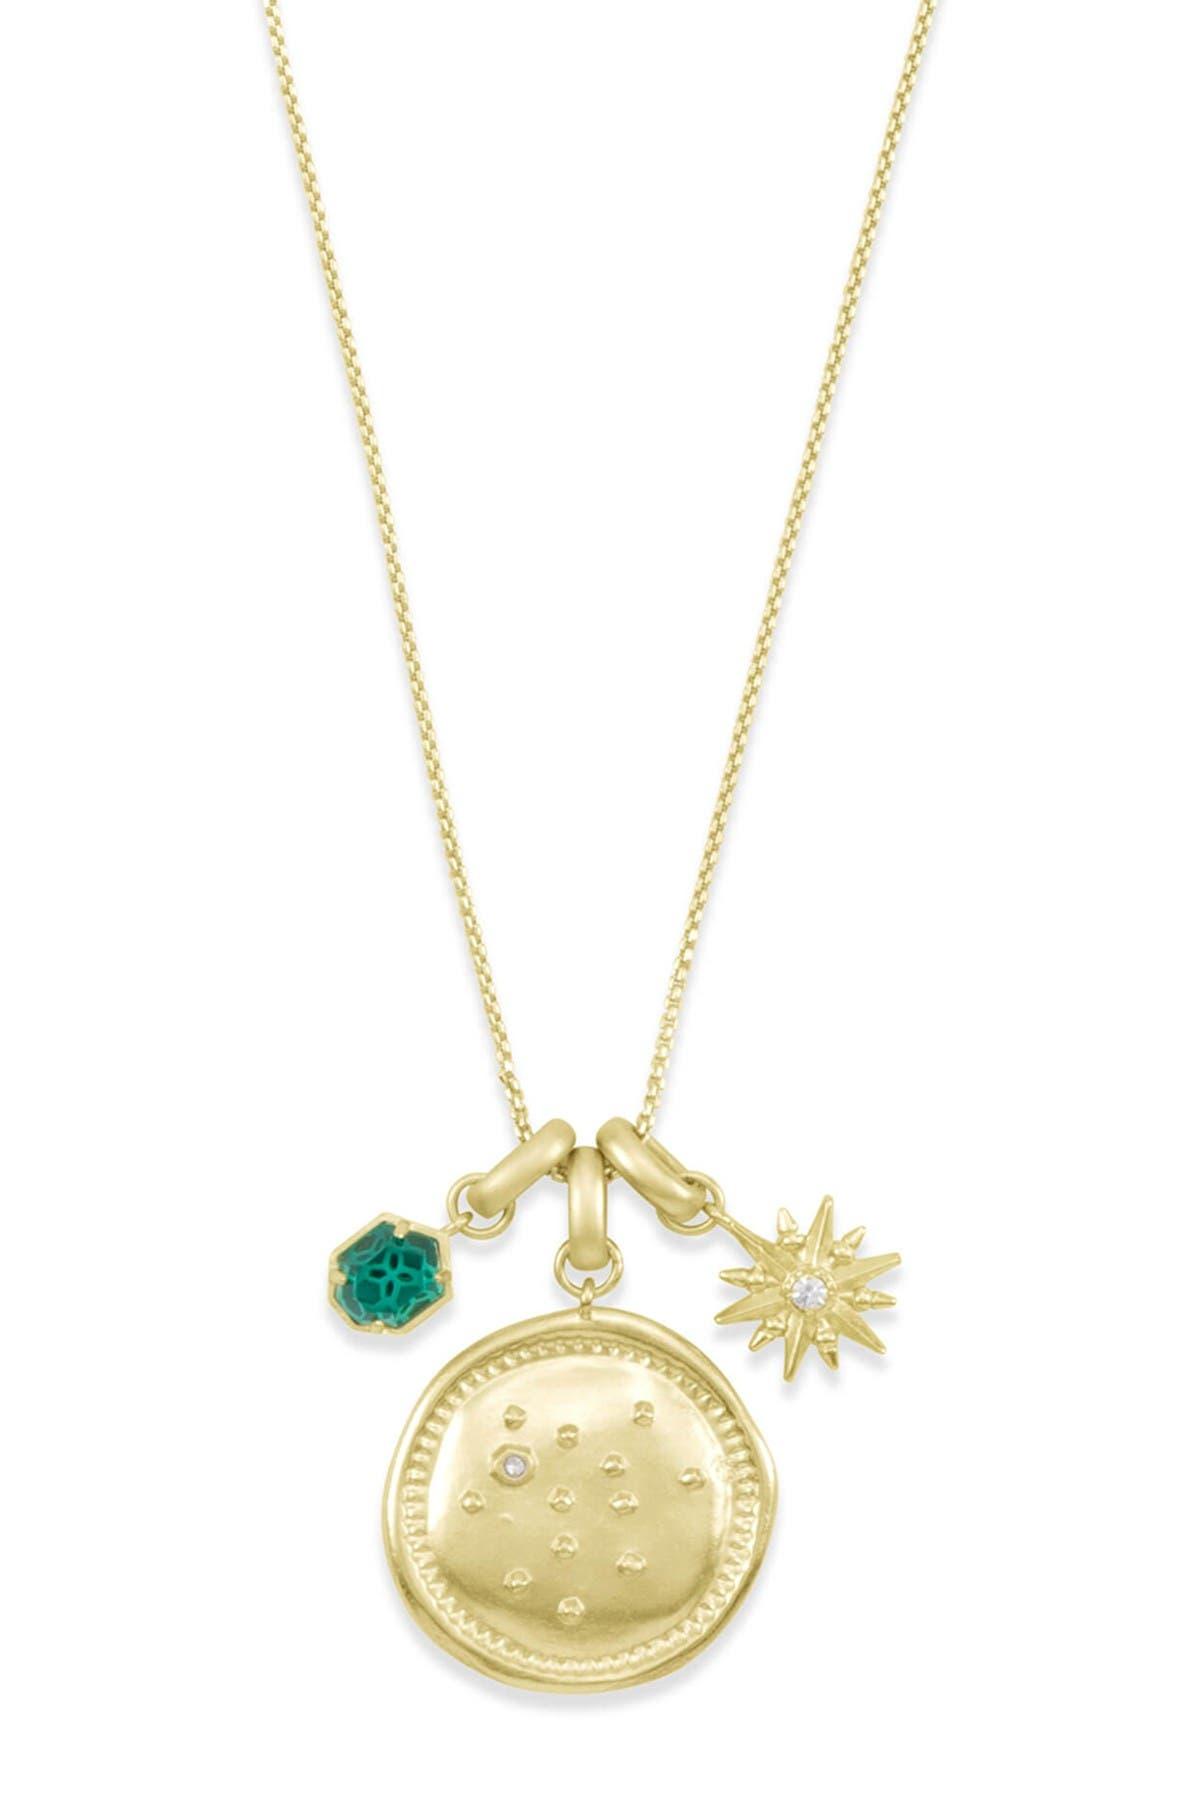 Image of Kendra Scott 14K Gold Plated Sagittarius Charm Necklace